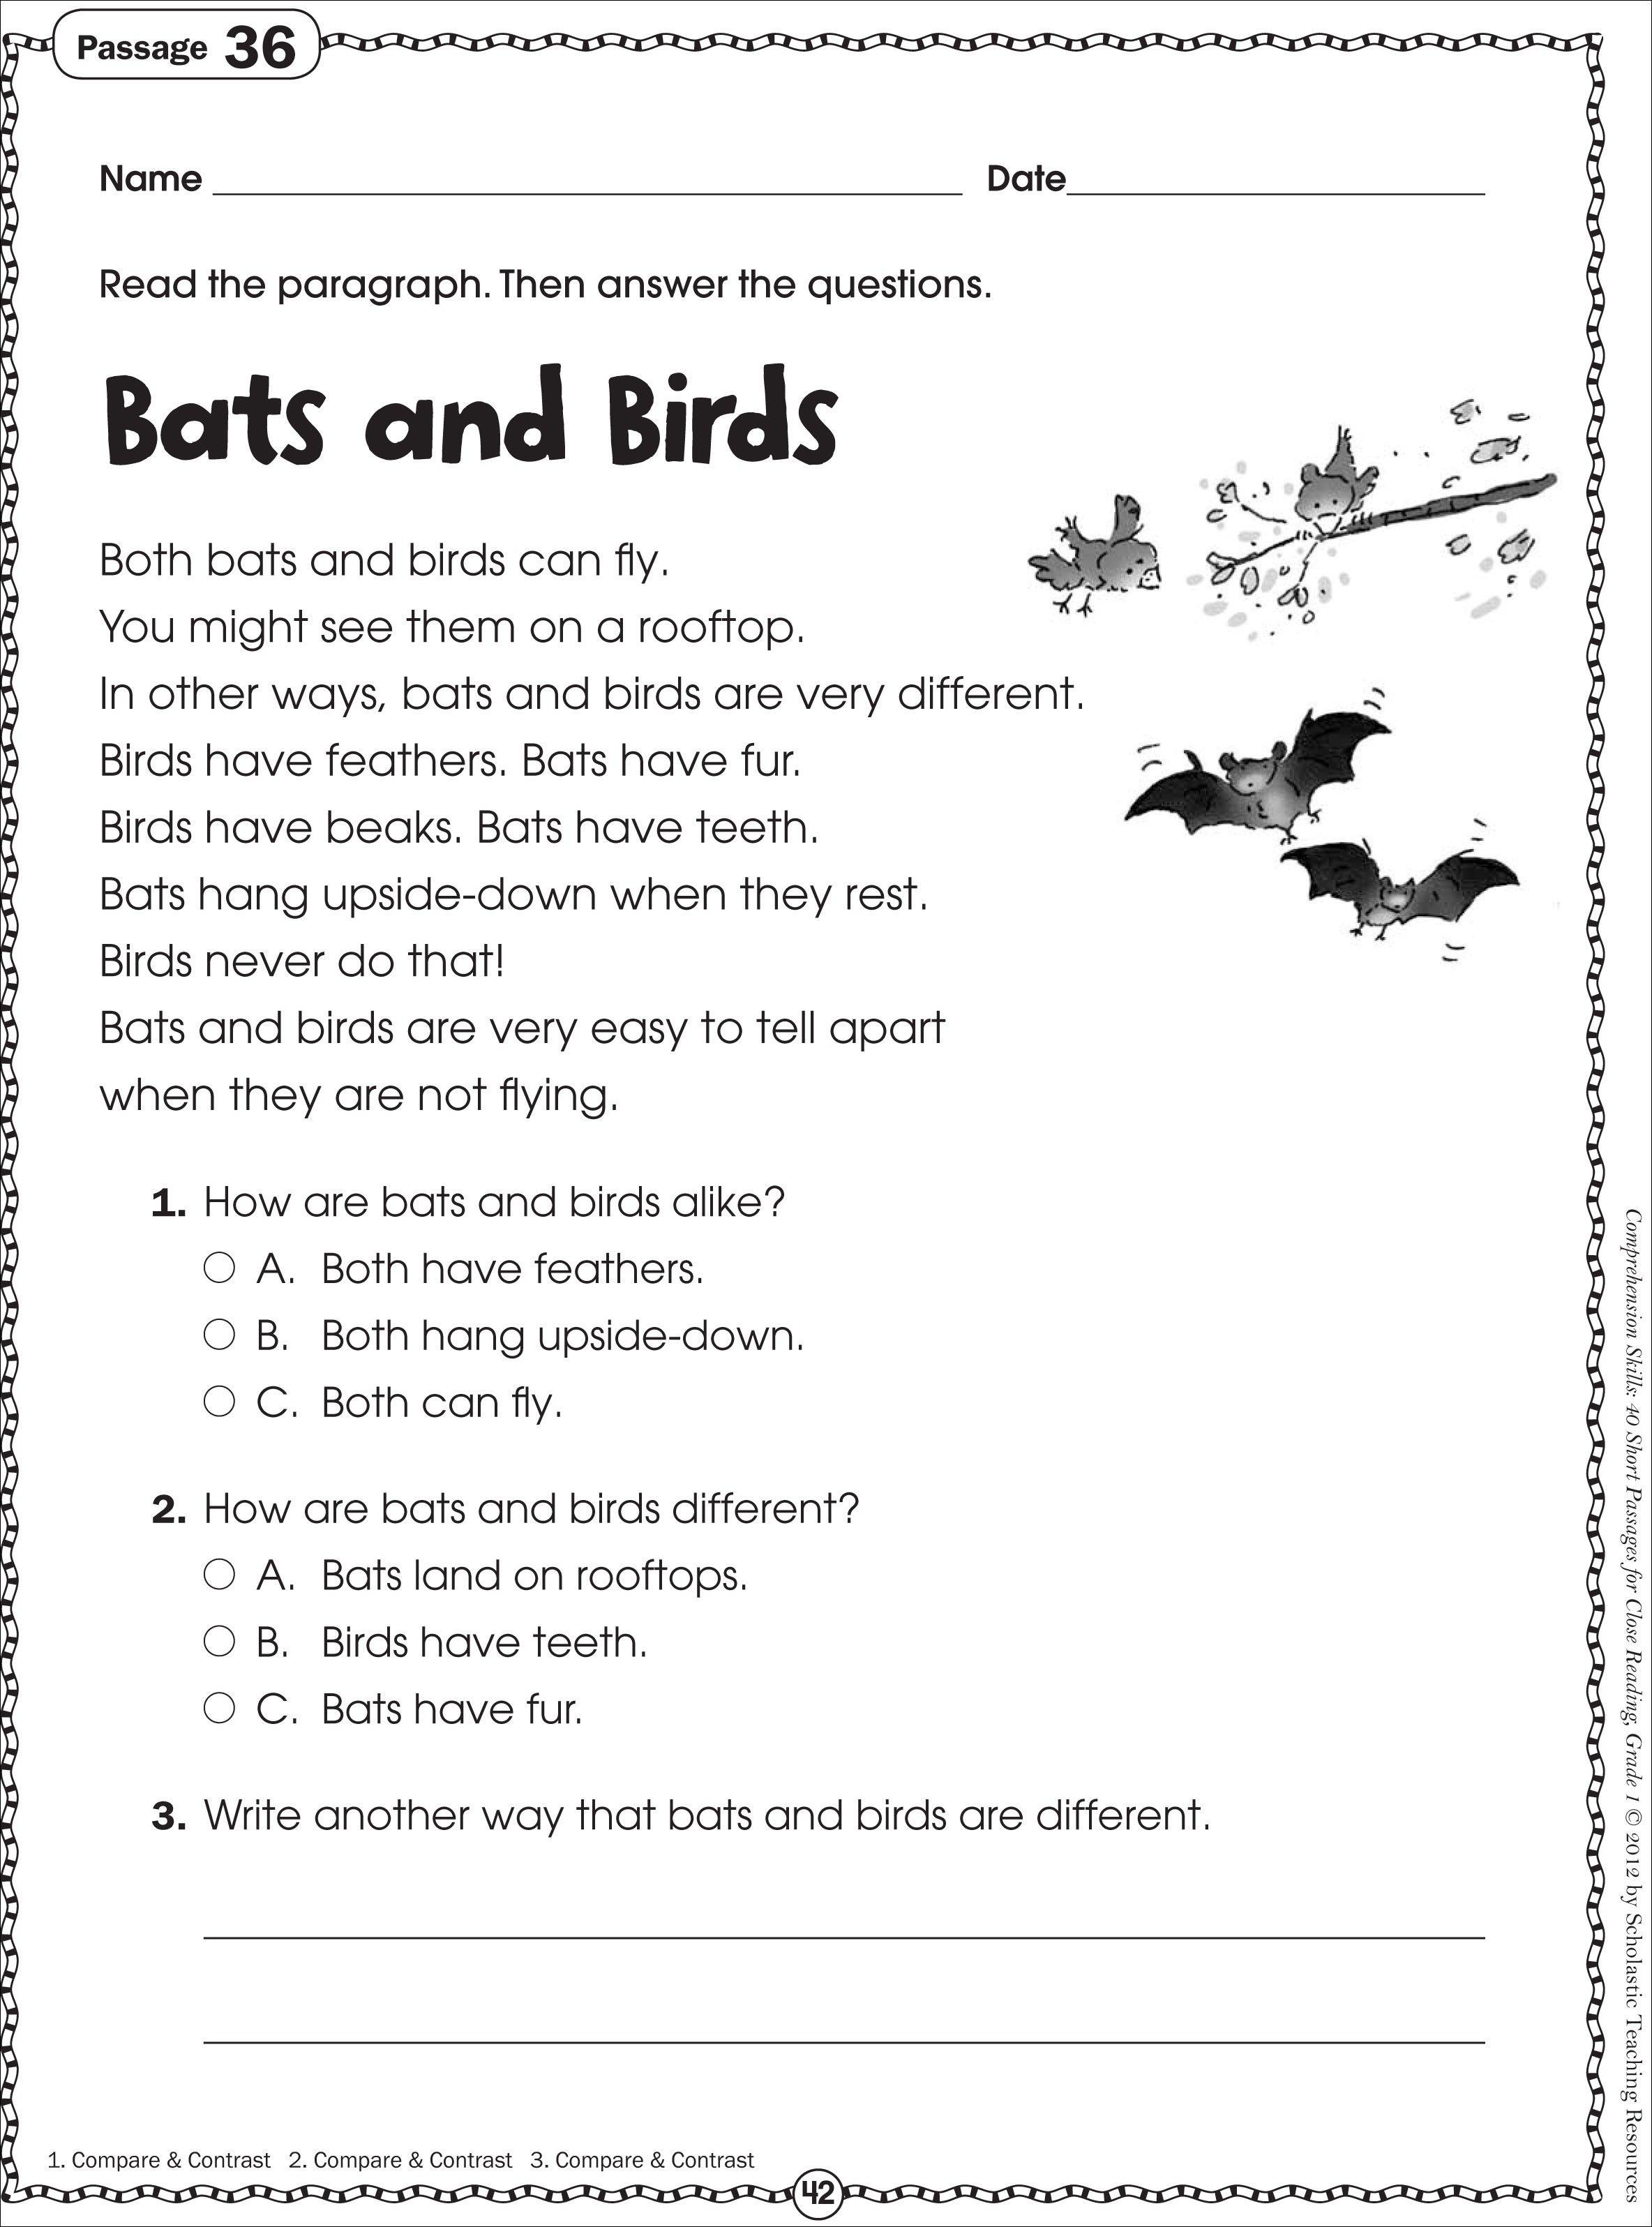 Free Printable Reading Comprehension Worksheets For Kindergarten - Free Printable Reading Activities For Kindergarten